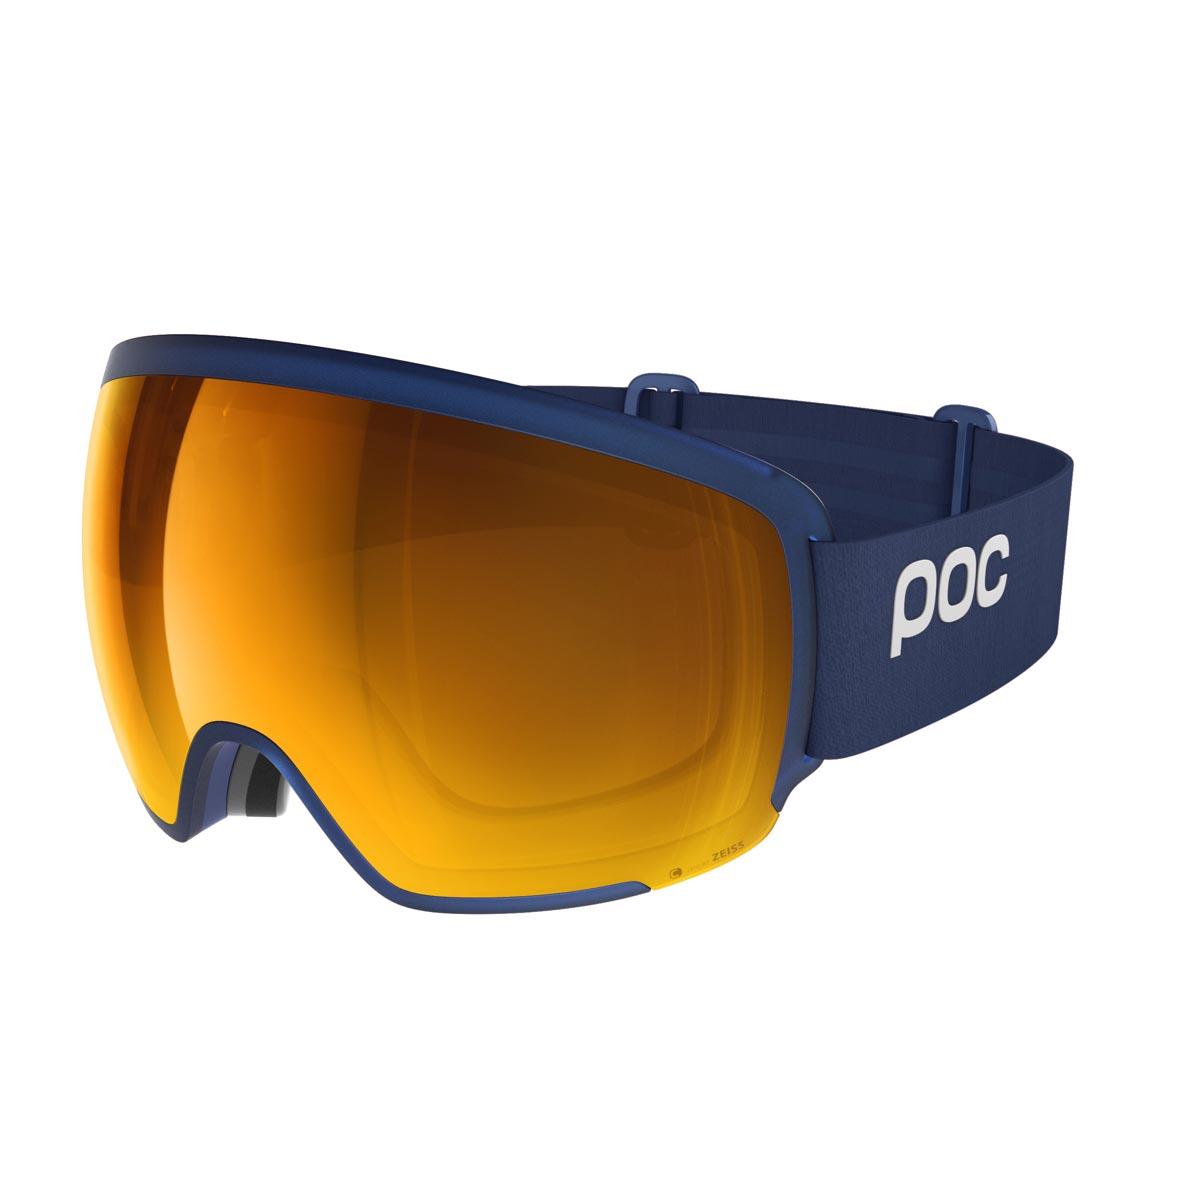 POC Orb Clarity Goggle 17/18